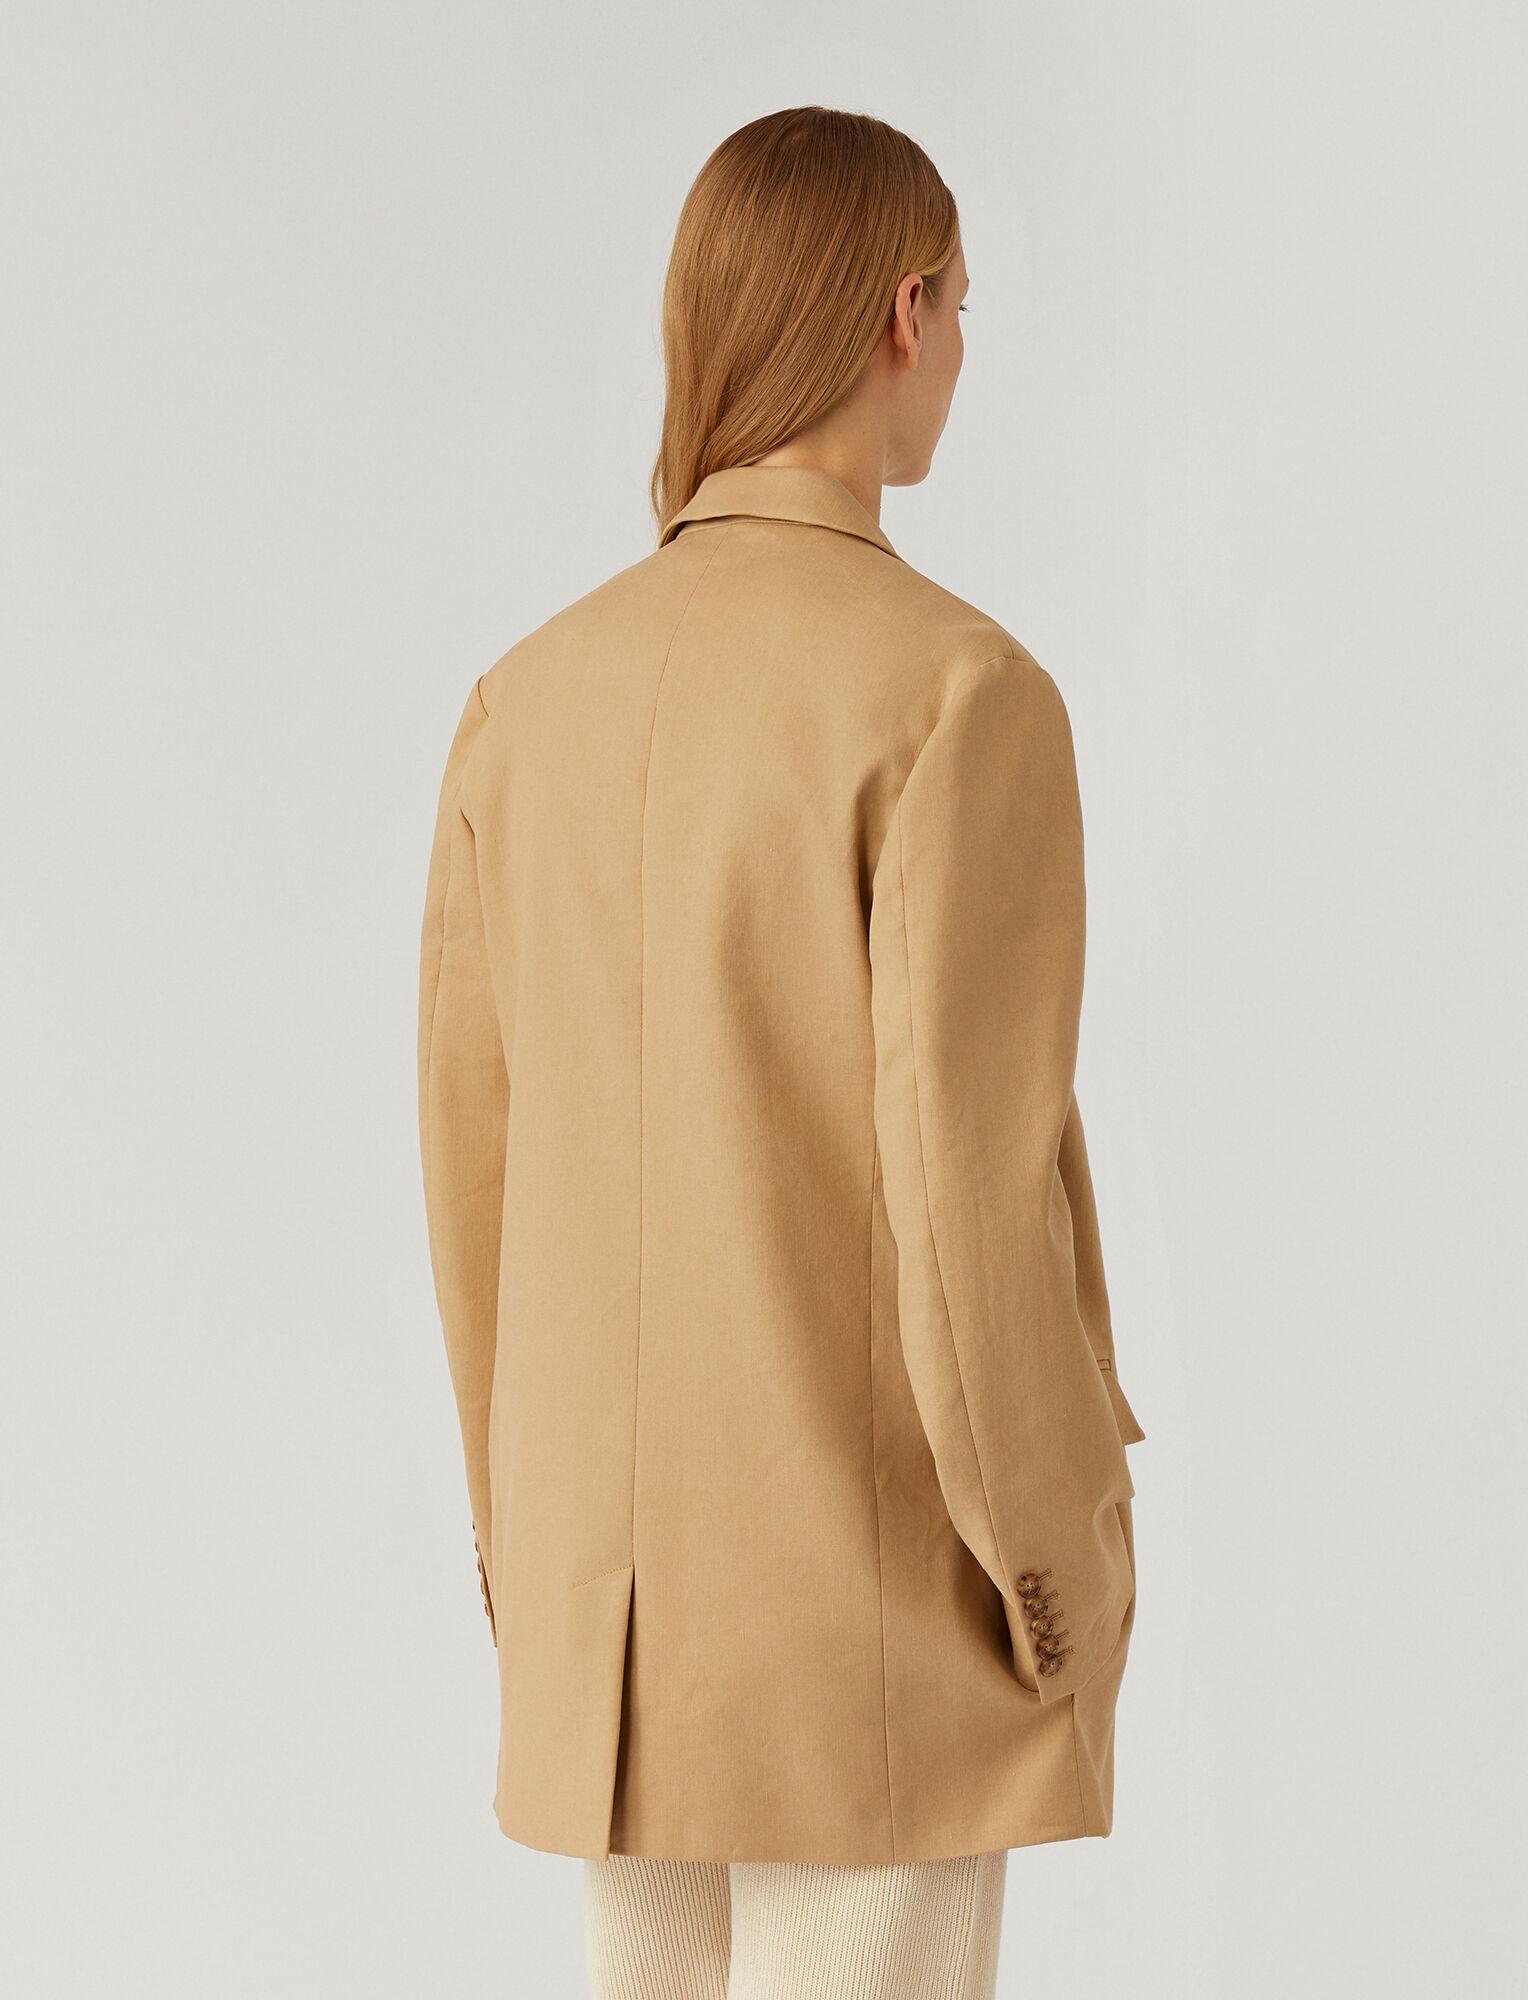 Joseph, Stretch Linen Cotton Julia Jacket, in TOFFEE